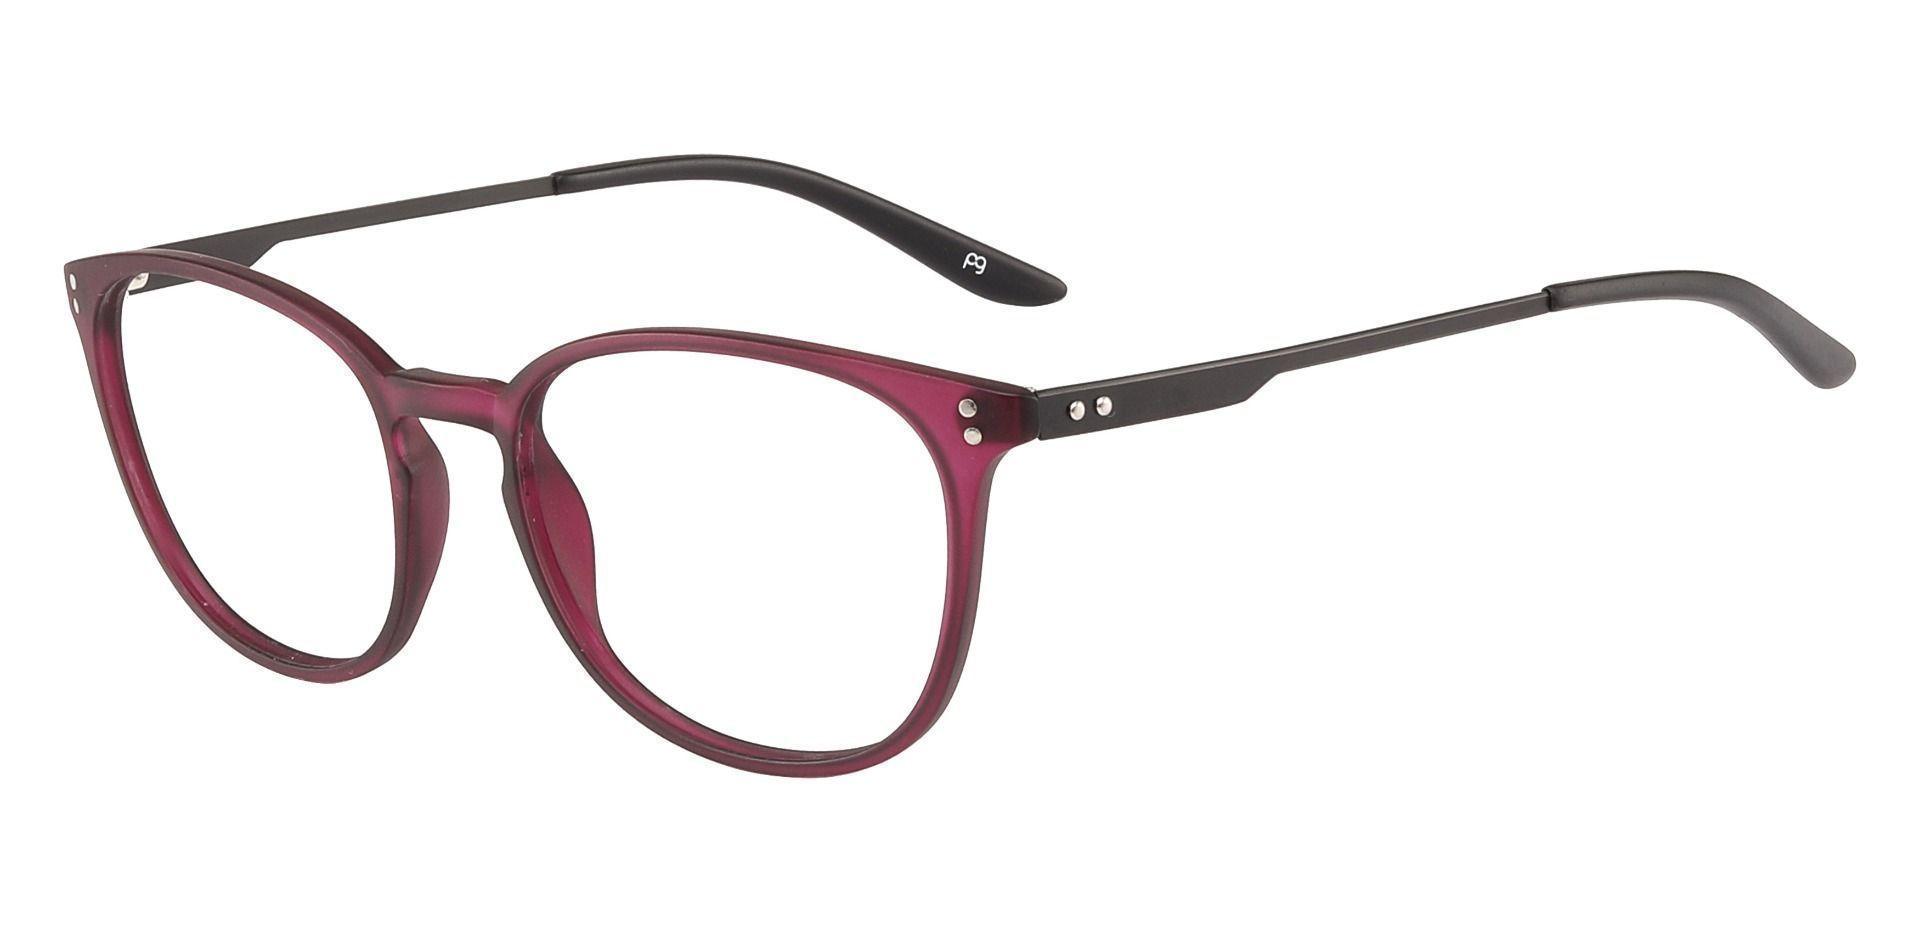 Wales Oval Prescription Glasses - Purple